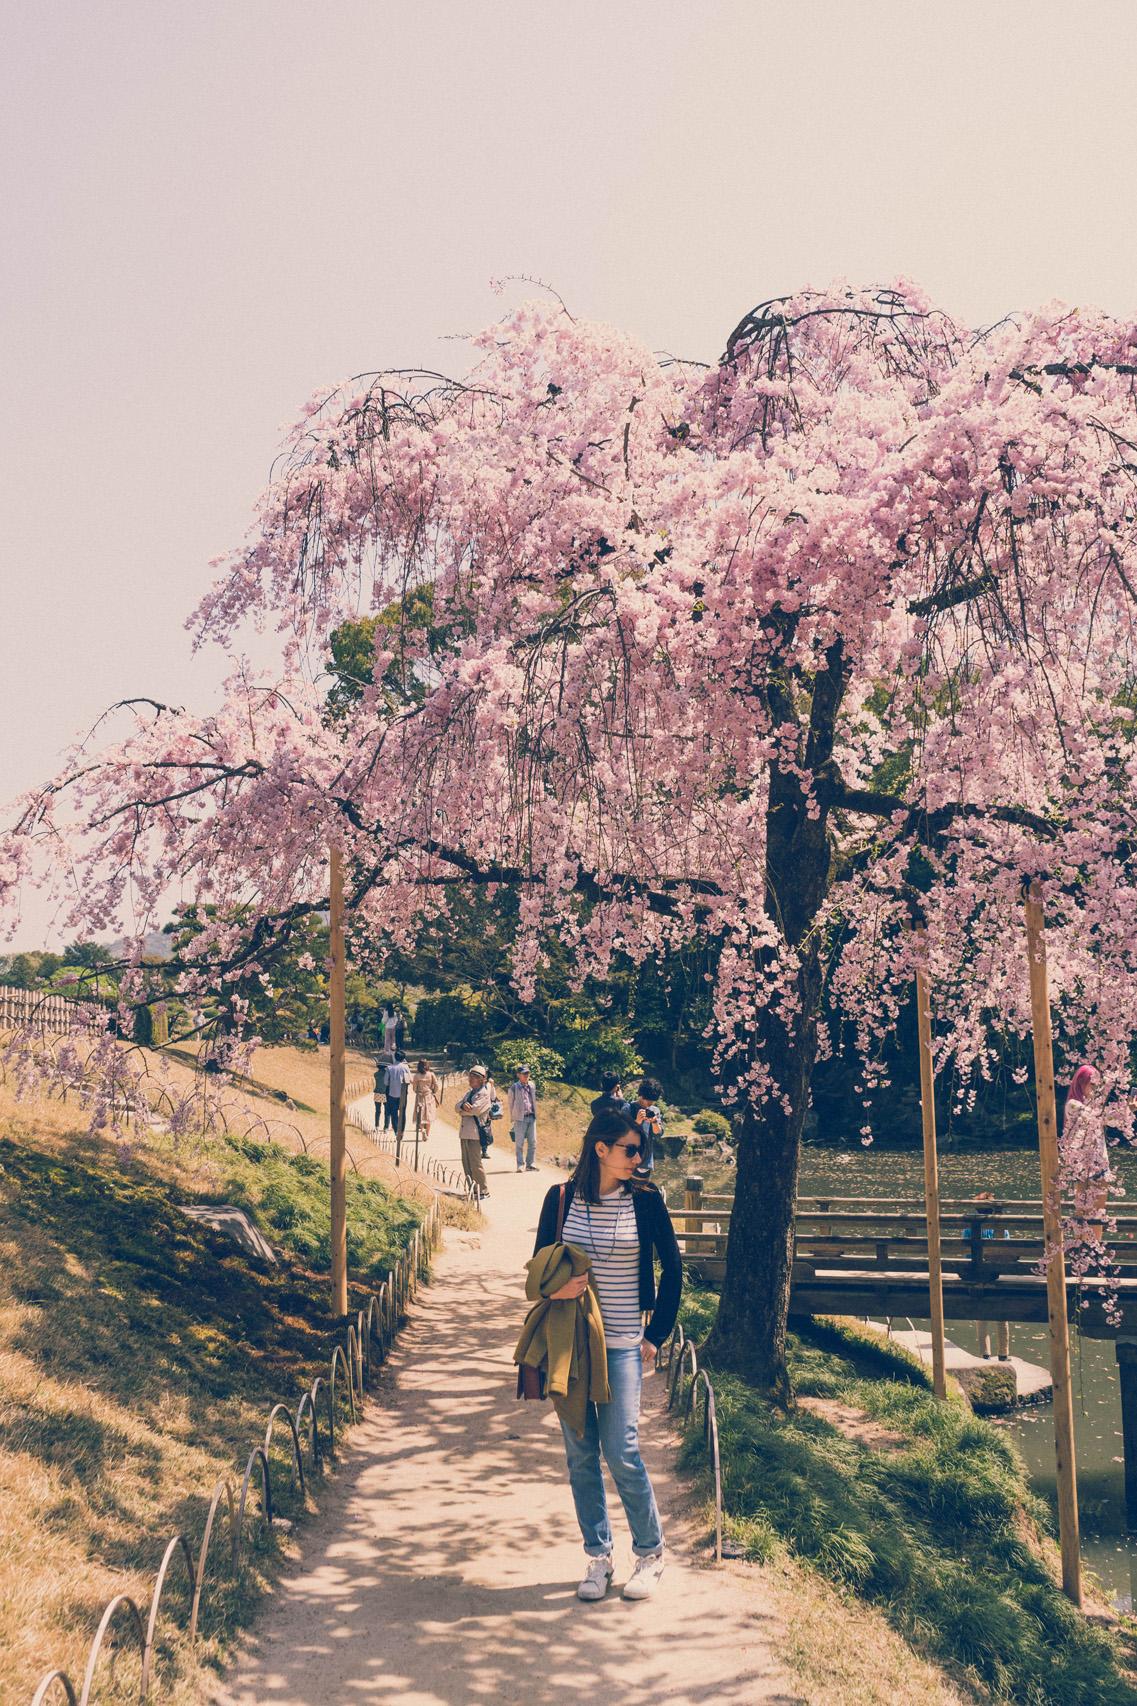 Blossoms in Korakuen garden, Okayama